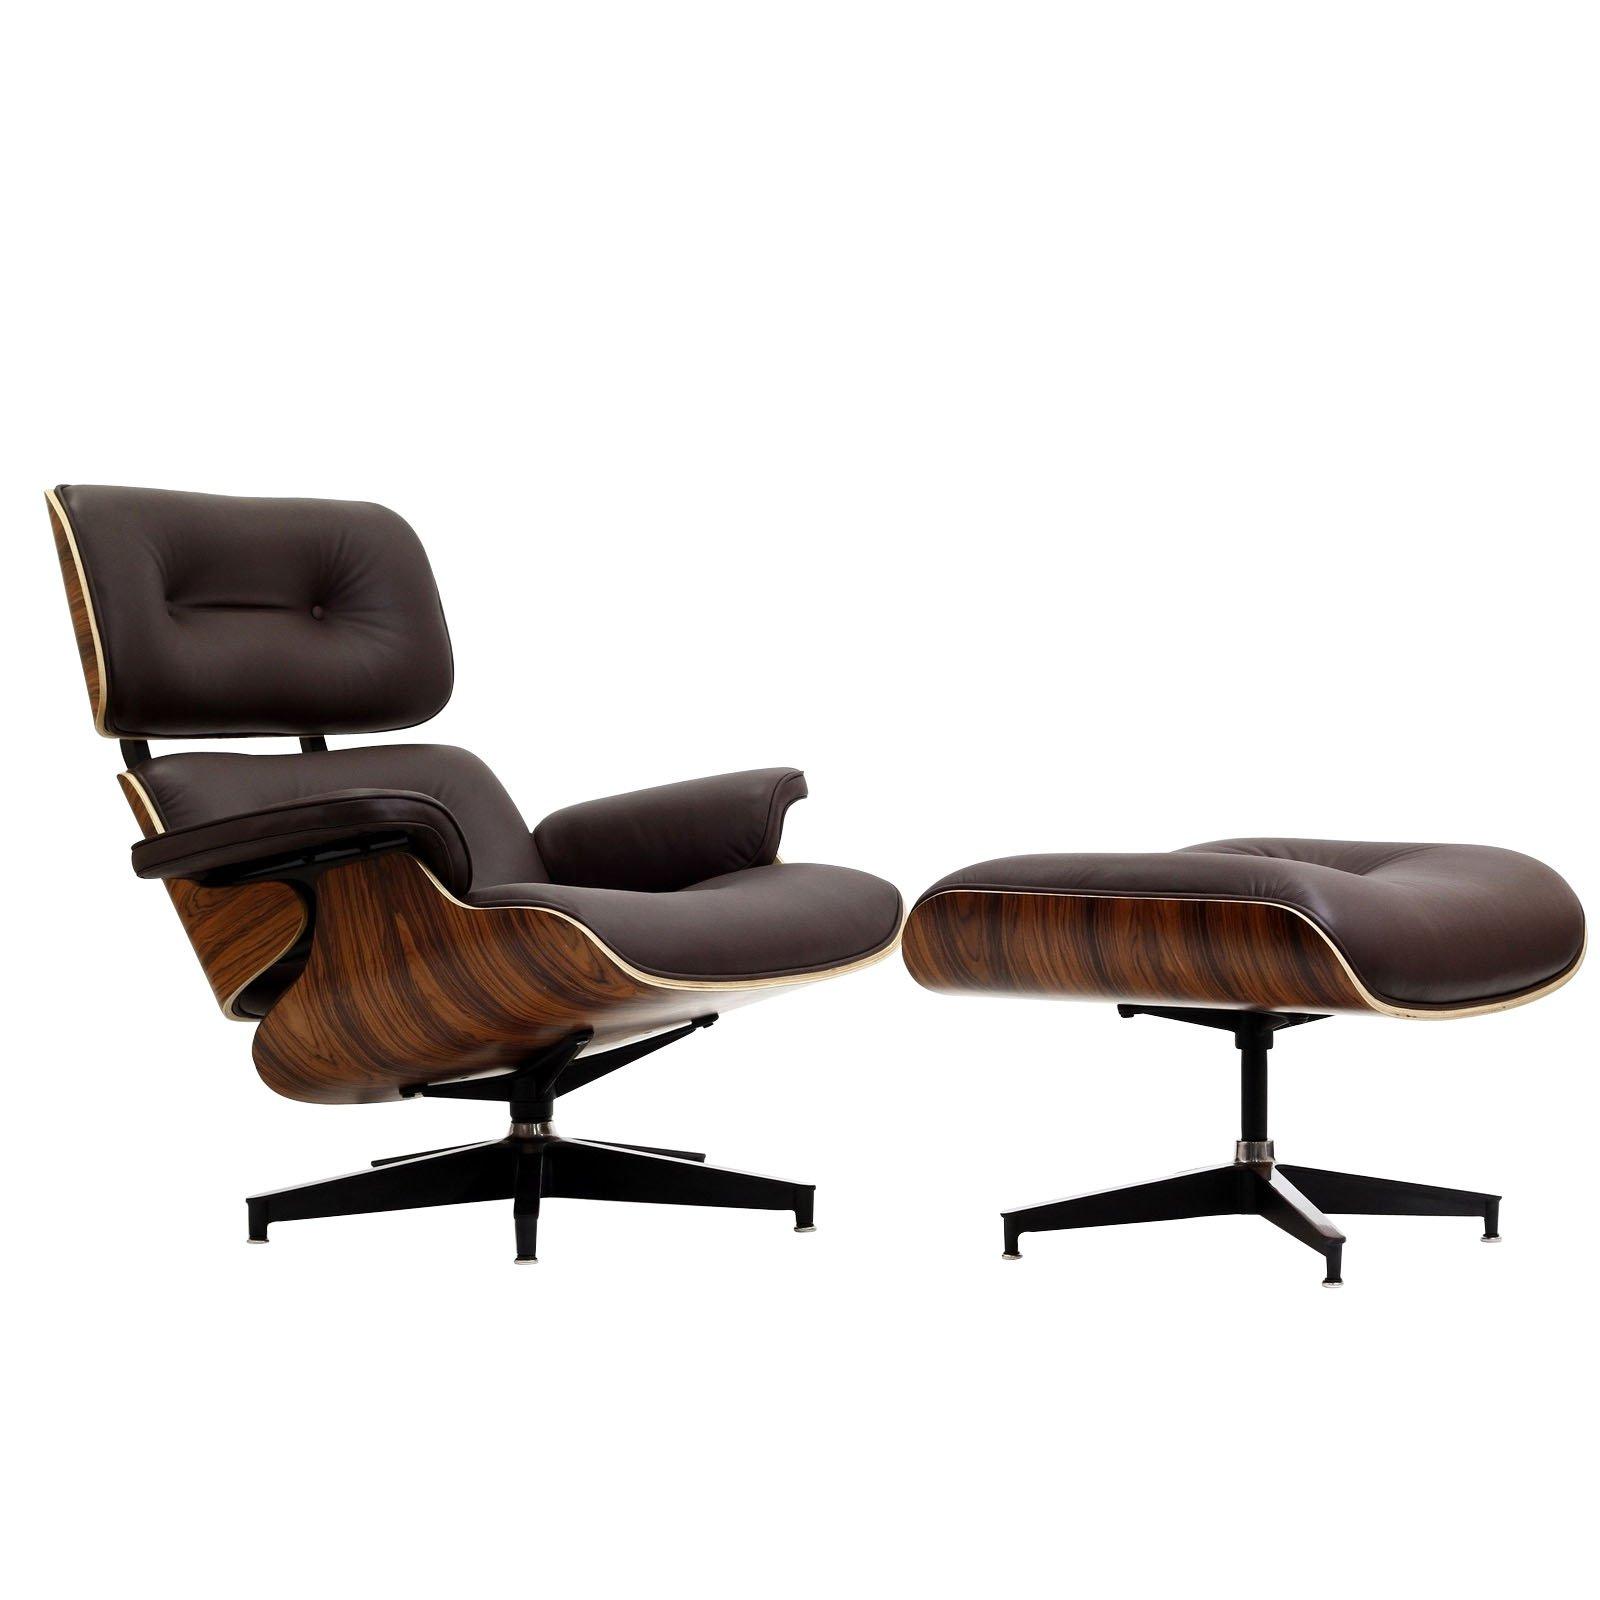 Eaze Lounge Chair Color - Brown.jpg